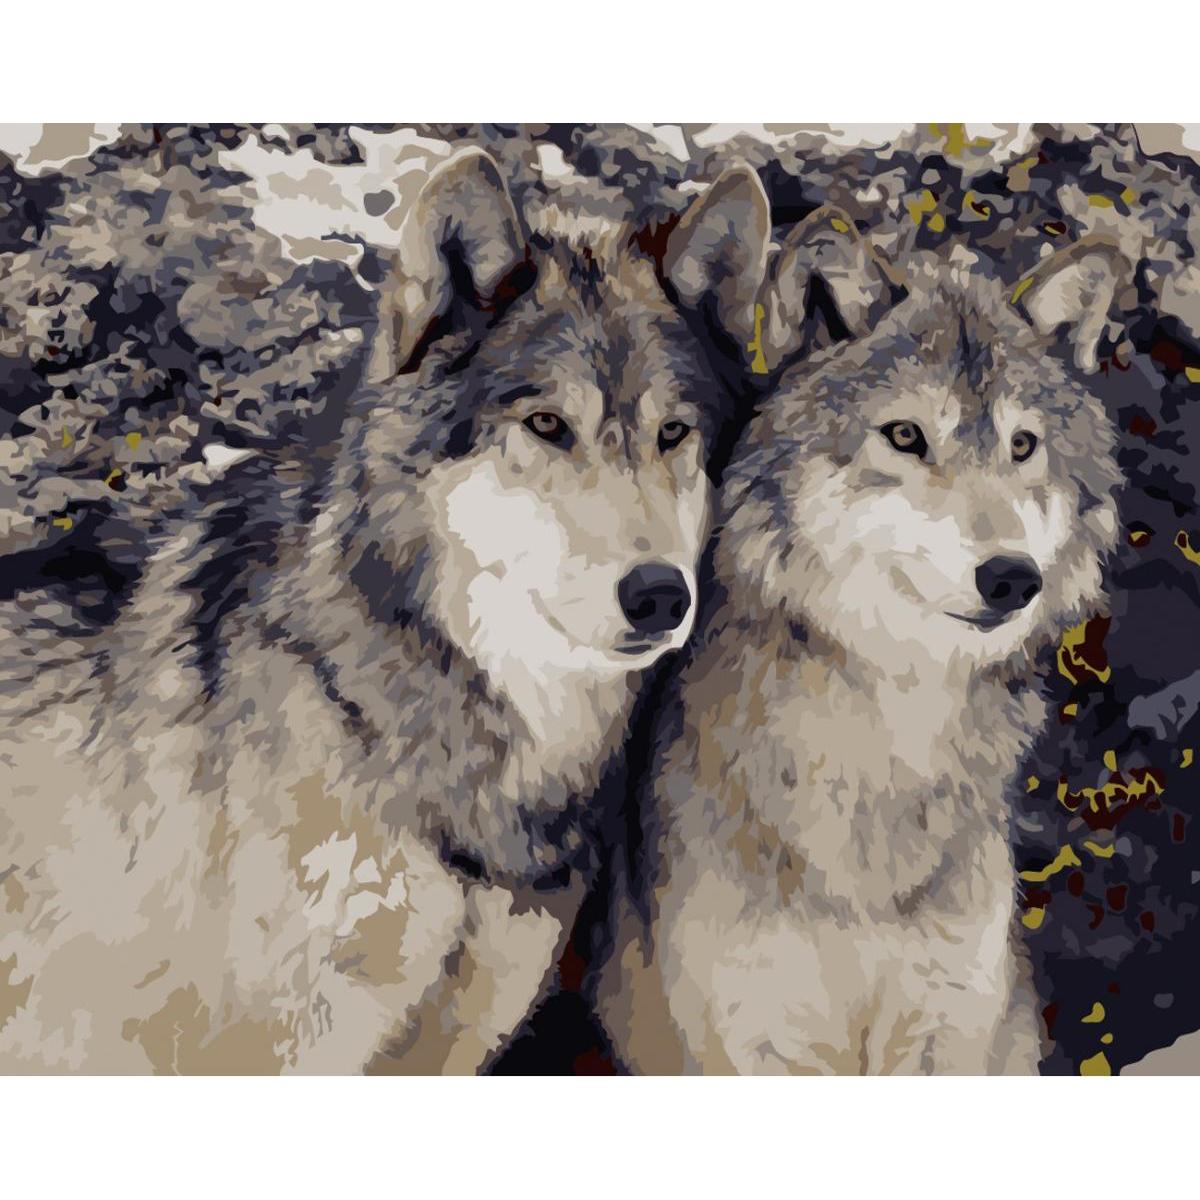 artstory Картина по номерам Преданность волка, 40х50 см в коробке, ArtStory (AS0170)